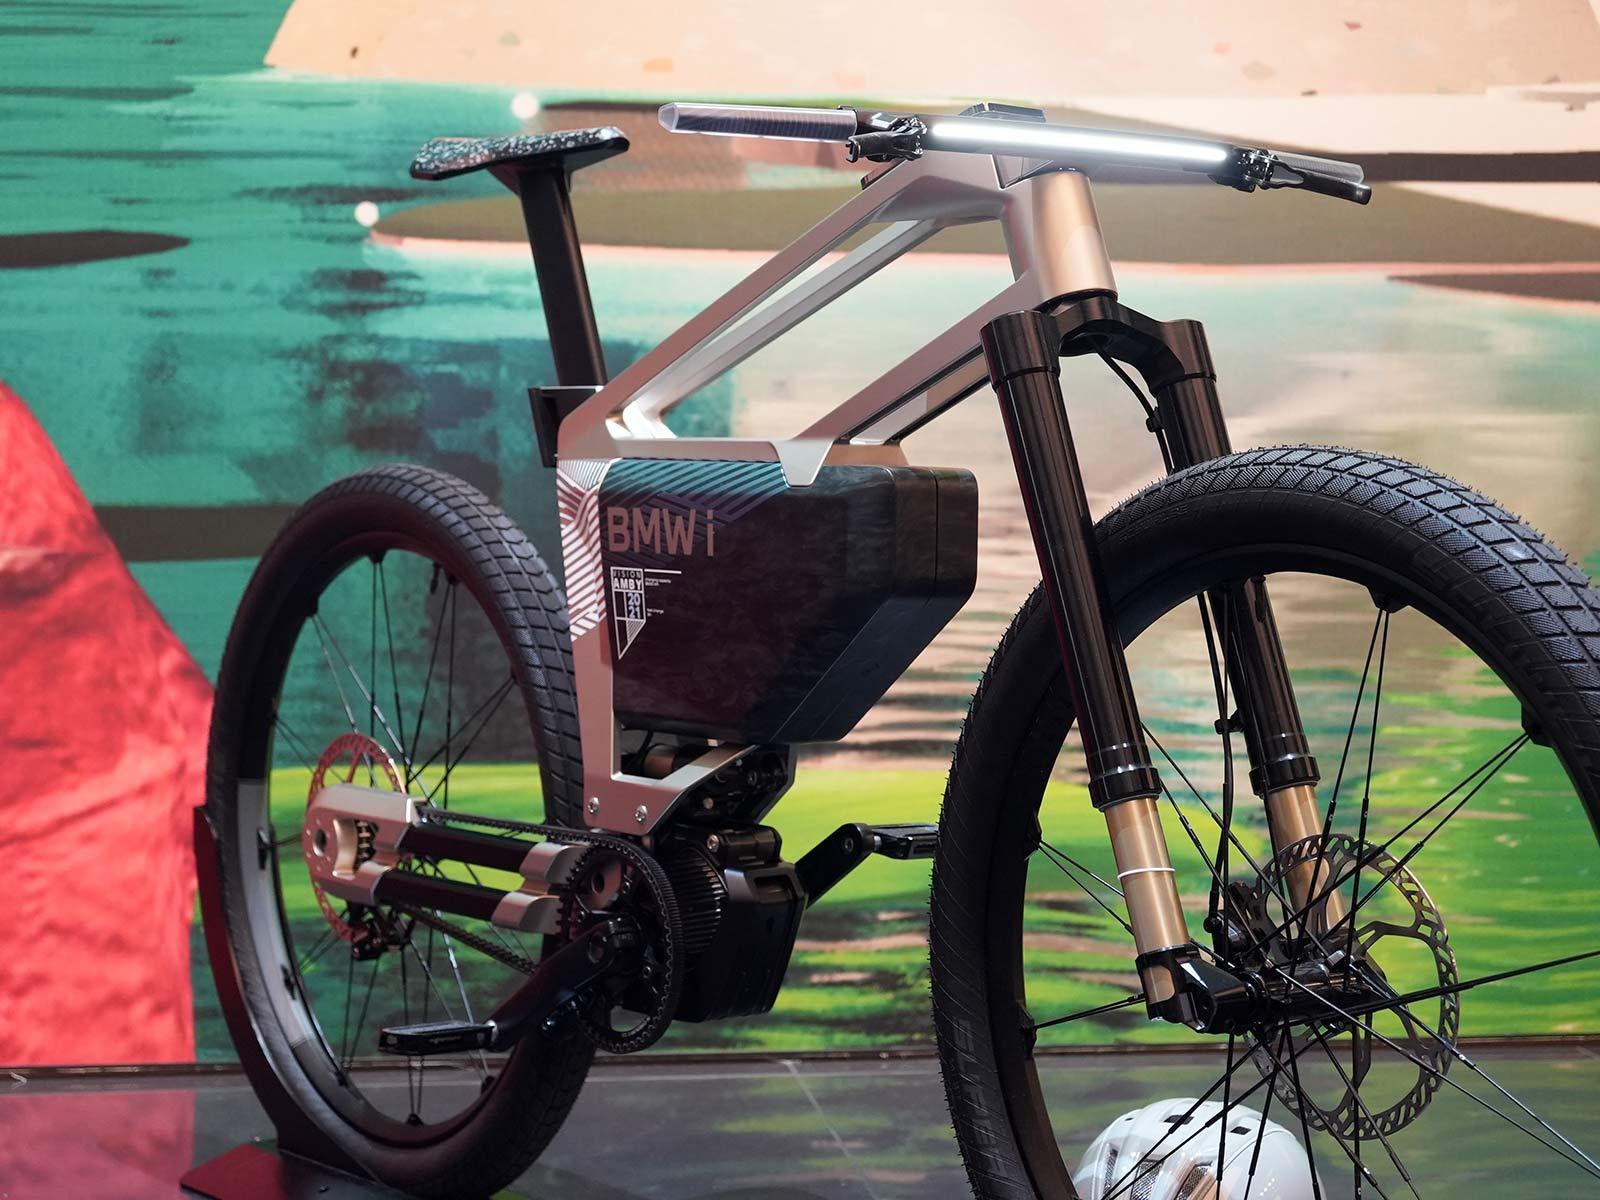 BMW e-mountain bike concept at IAA Mobility show